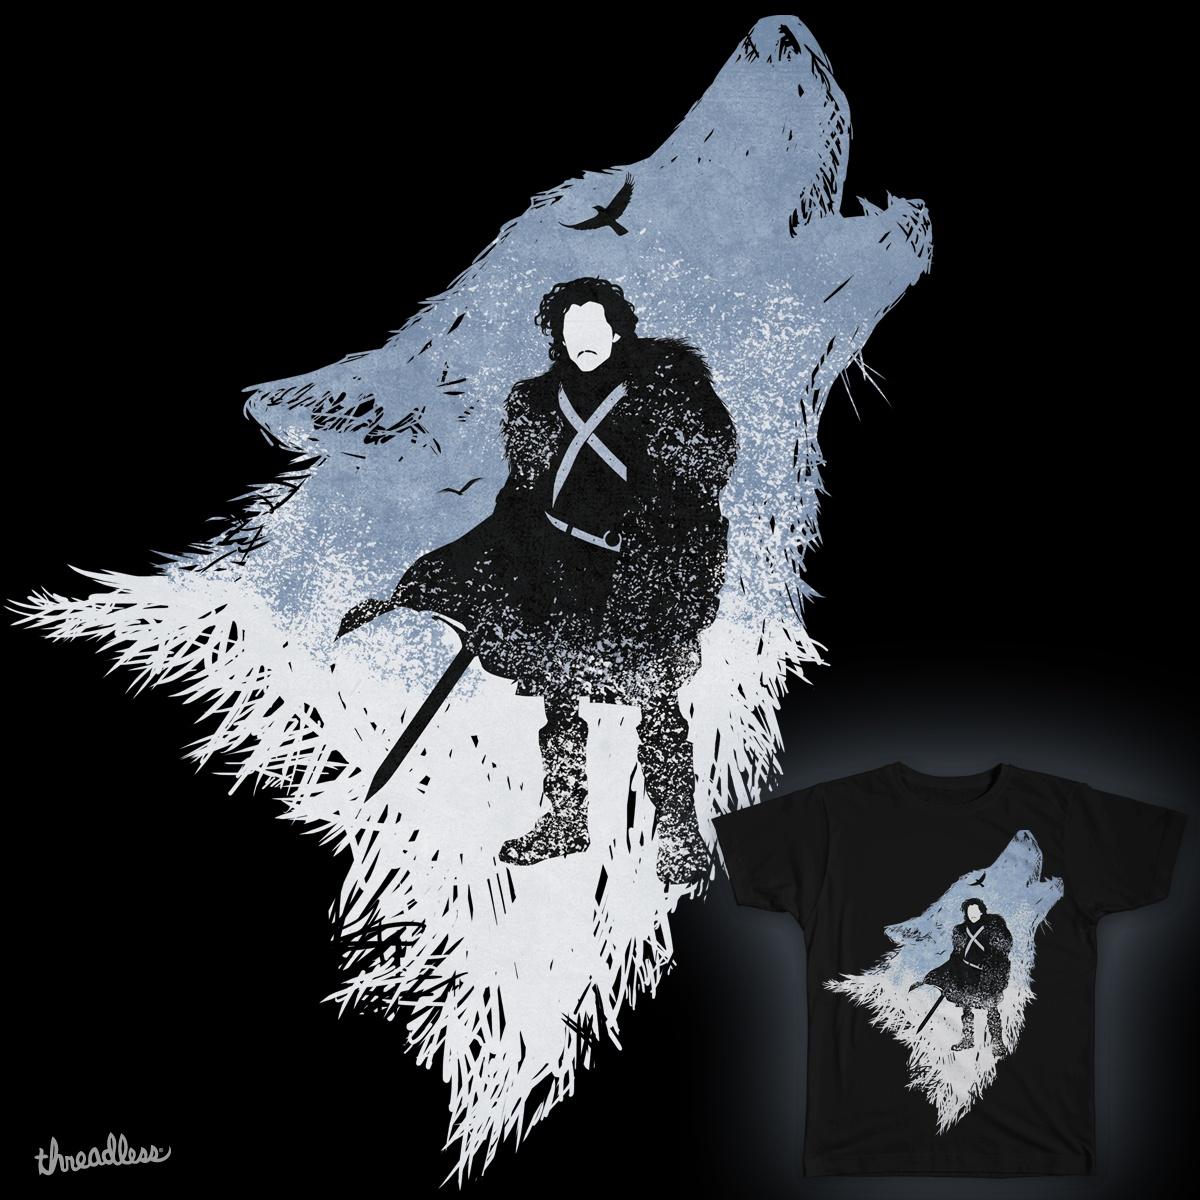 Jon Snow the Crow by Chimaera Wear on Threadless